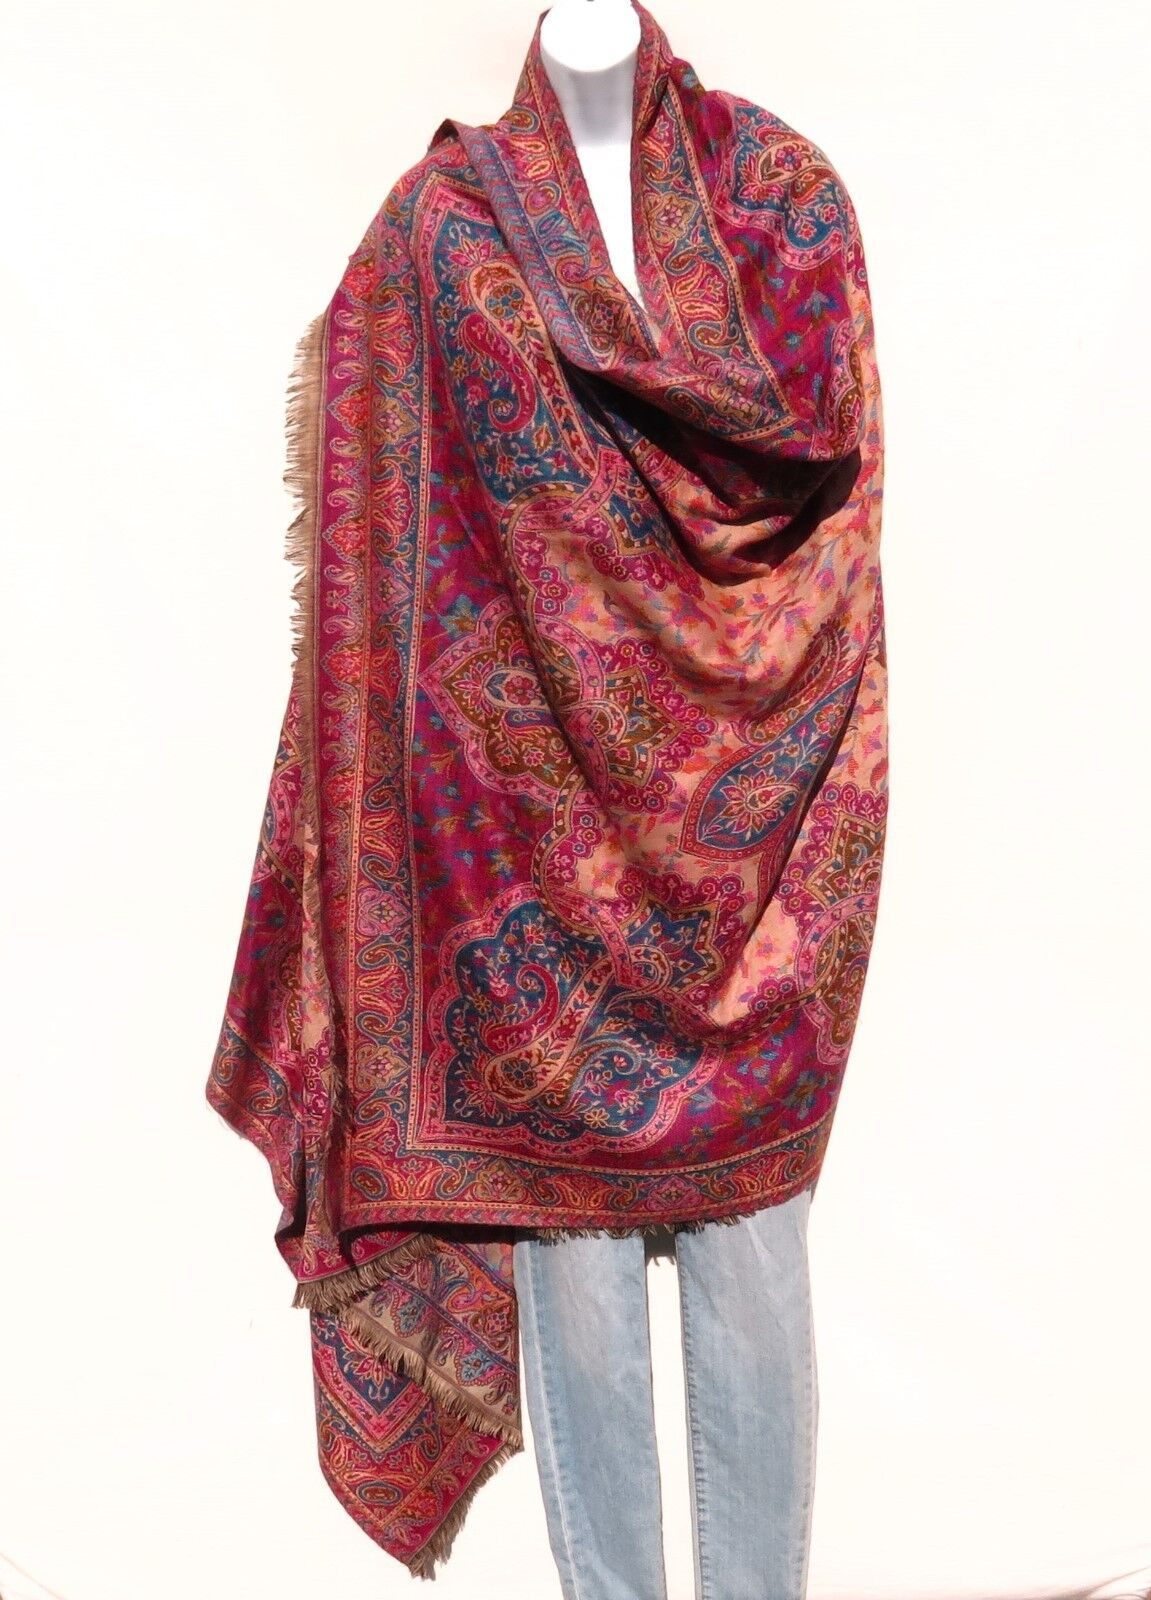 Yak Sheep Wool Blend Shawl Throw Handloomed  Kashmir color  Fuchsia Cyan Sand